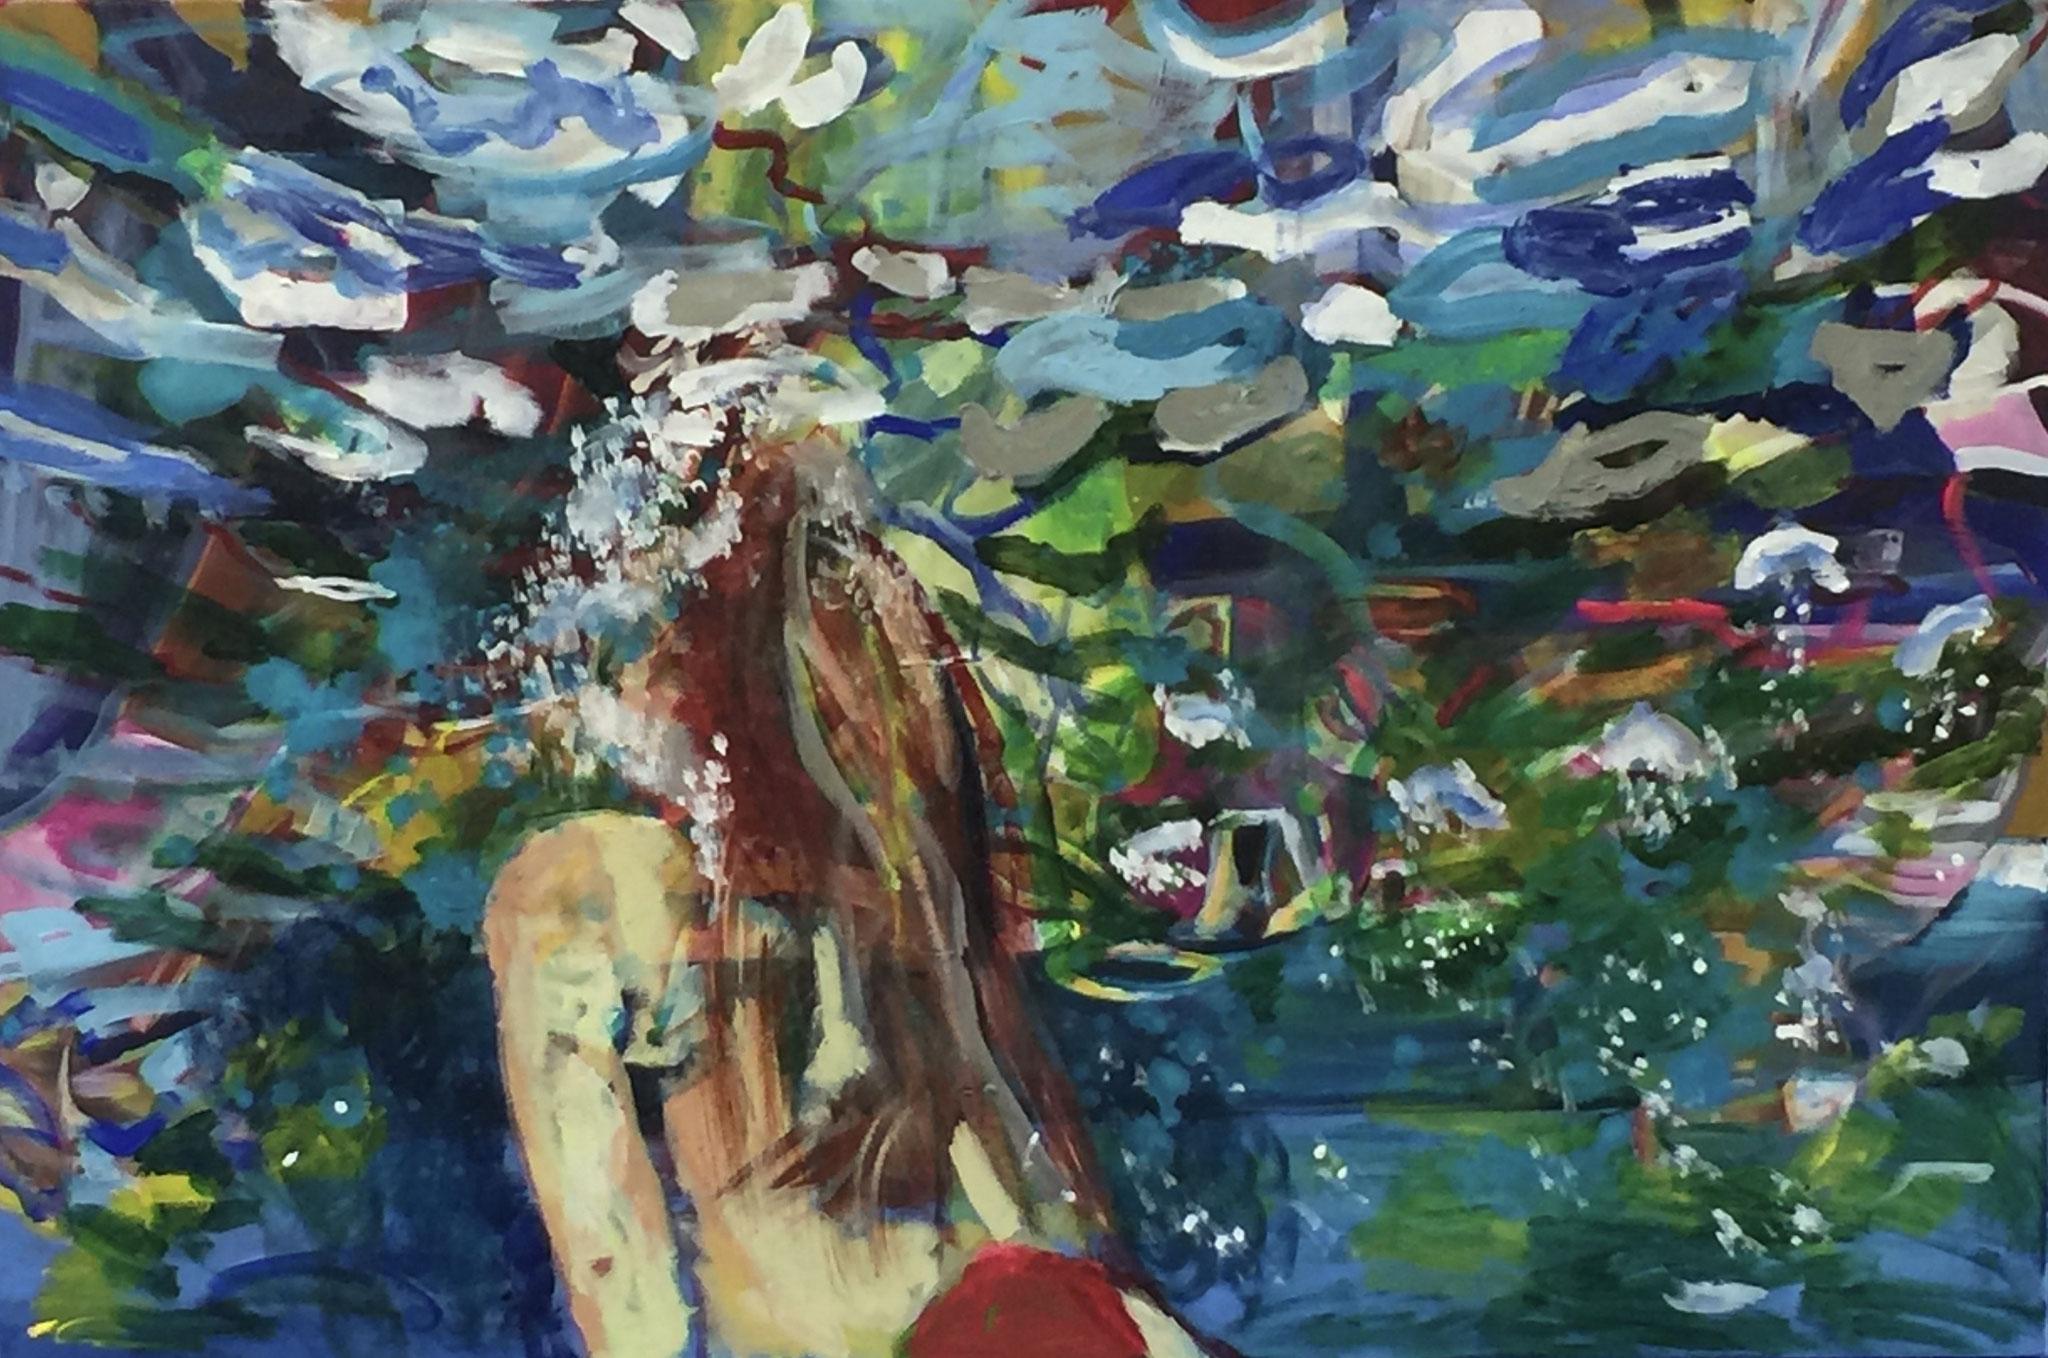 Wasser 1, 120x80 acrylic on canvas